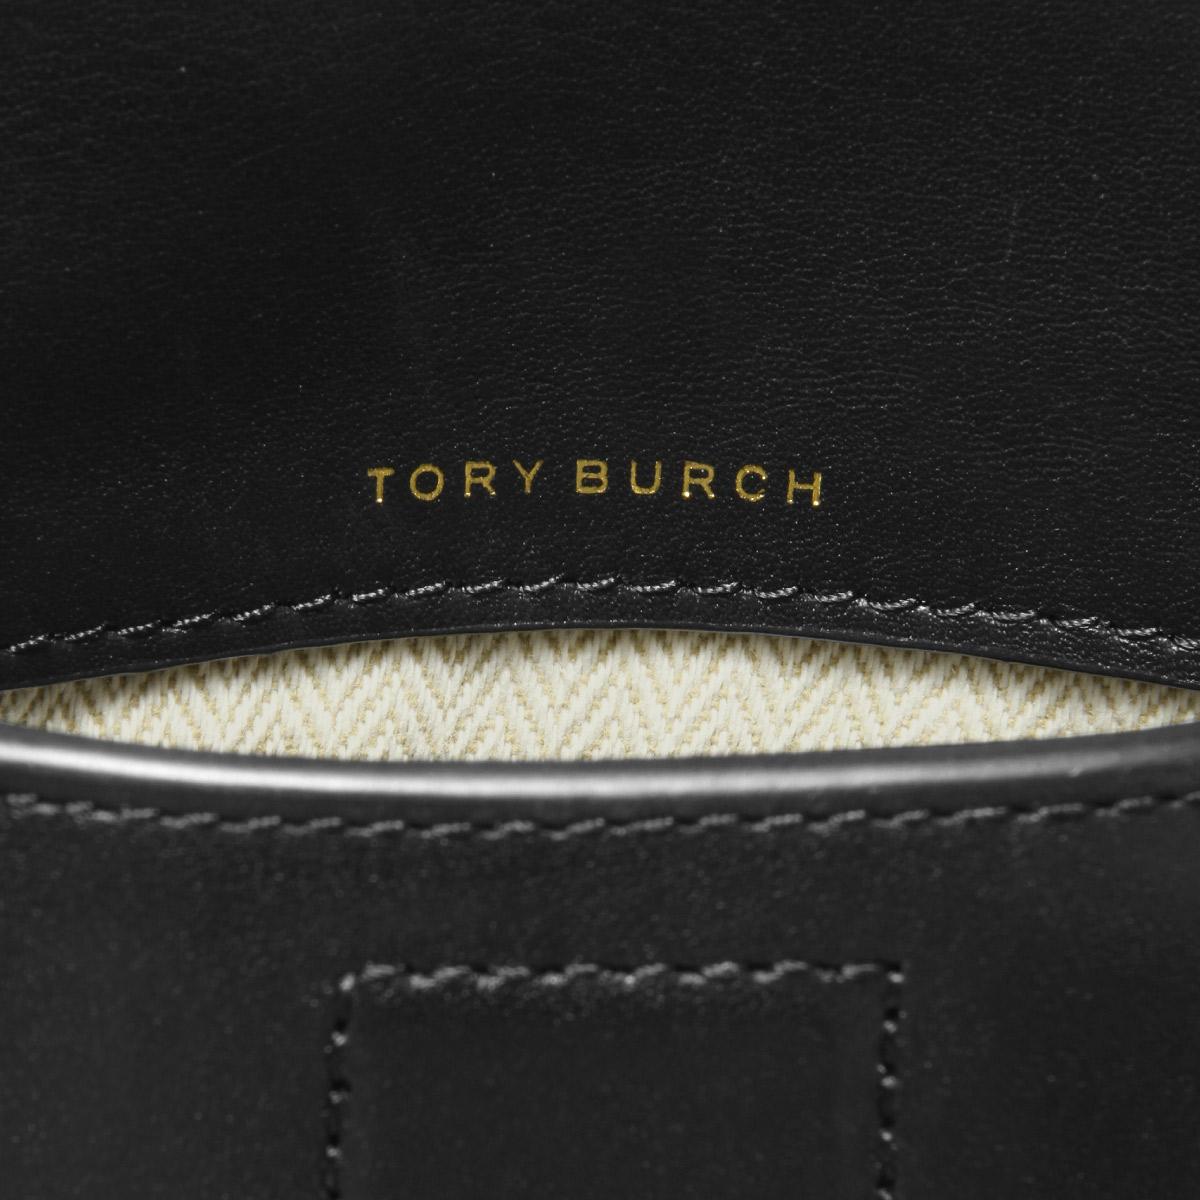 TORY BURCH トリー バーチ | ショルダーバッグ | MILLER PHONE ミラー フォン